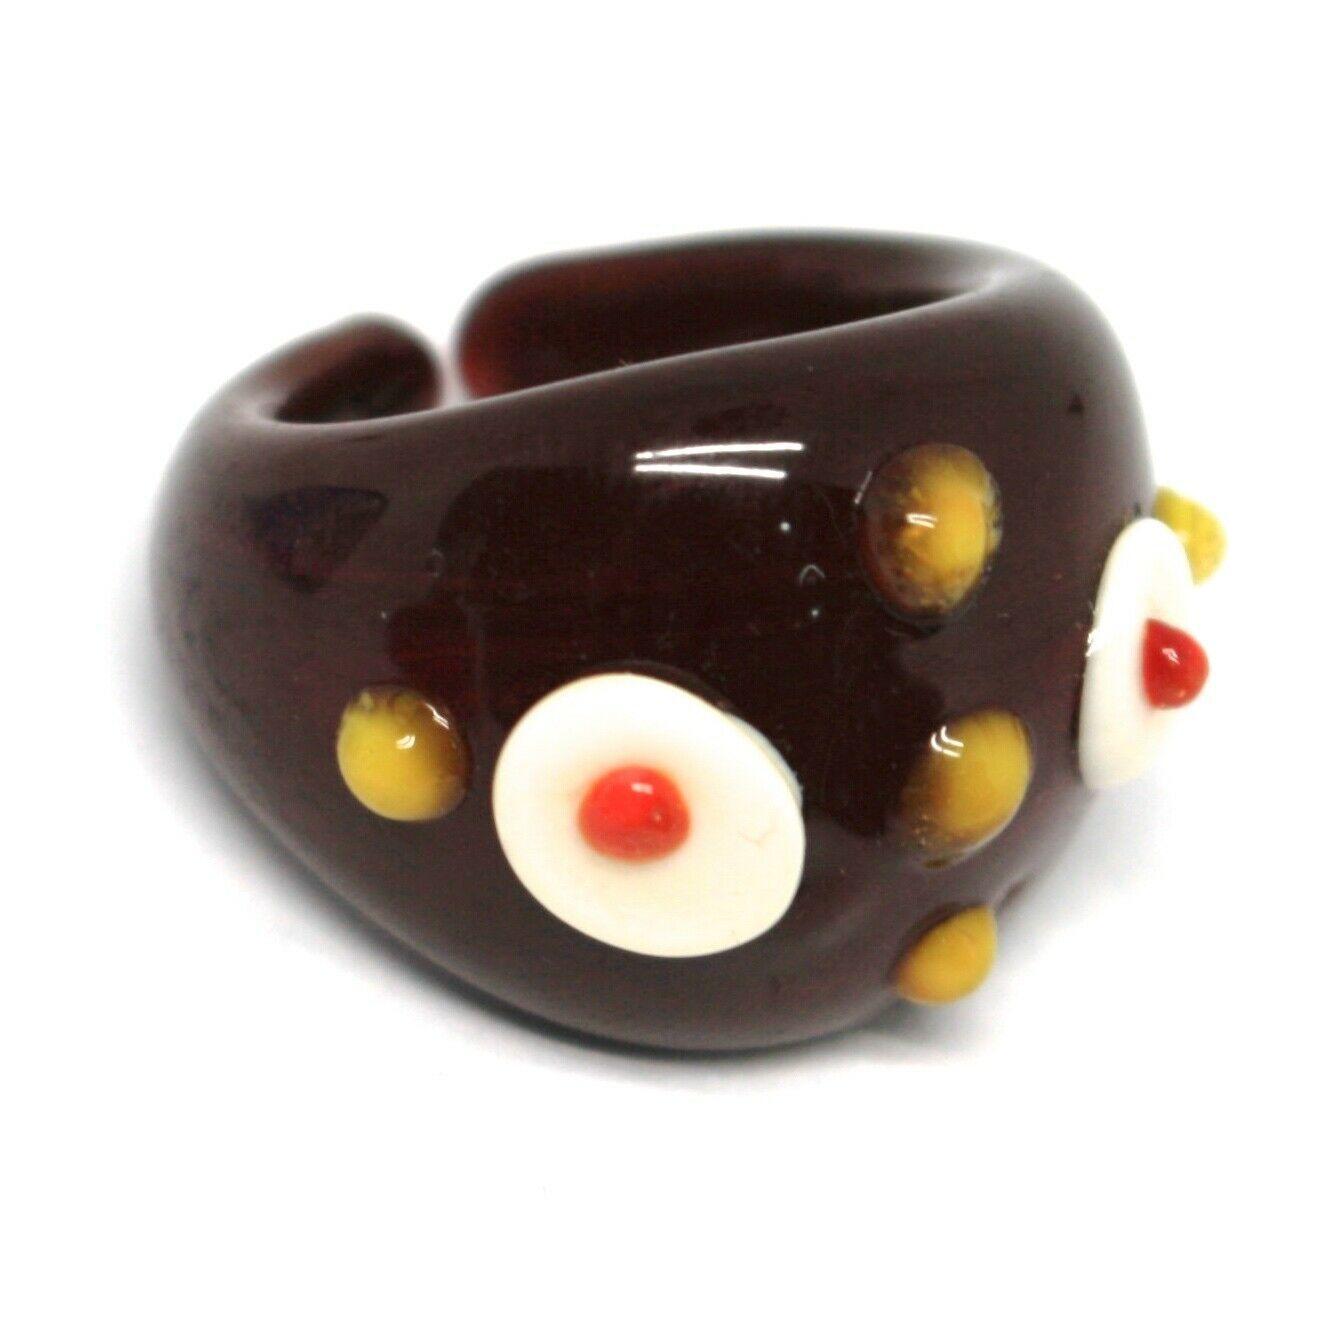 Ring Antica Murrina, Murano Glass, Brown, Discs, Polka dot Embossed